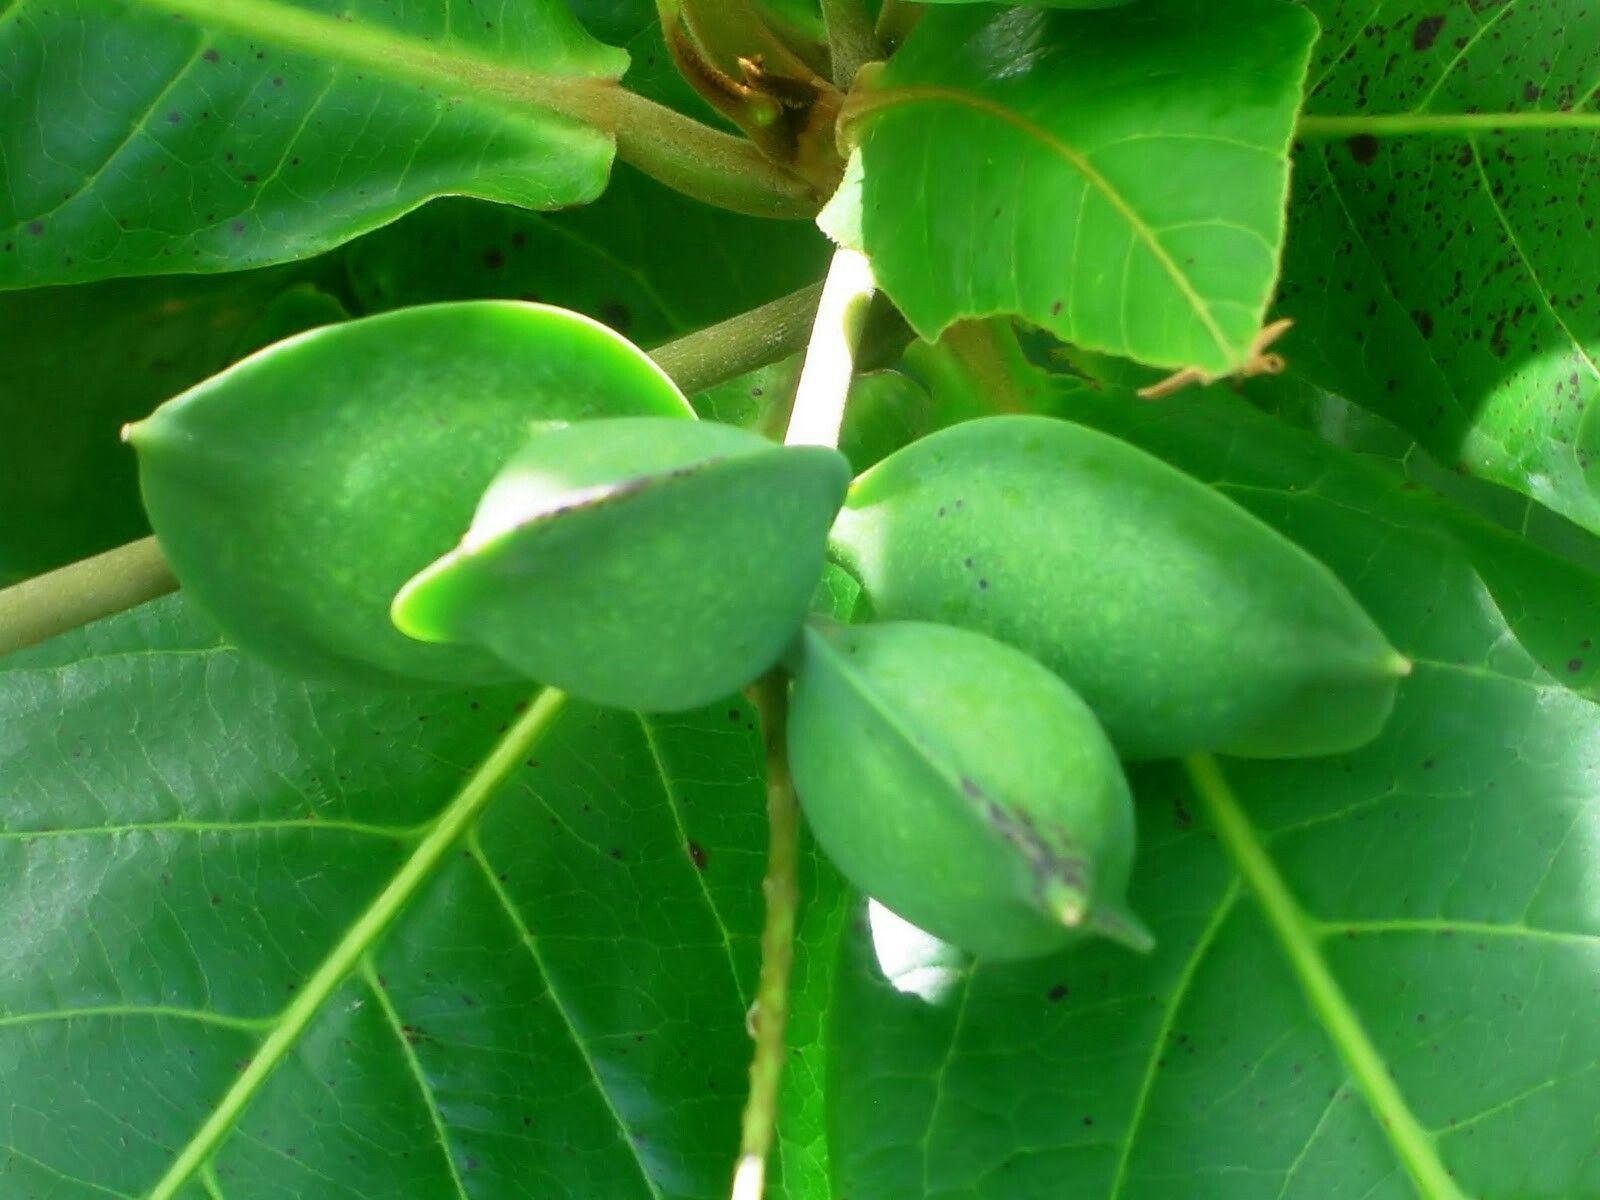 Almond Tree In Spanish Almendra Puerto Rican Fruts1 Arbol De